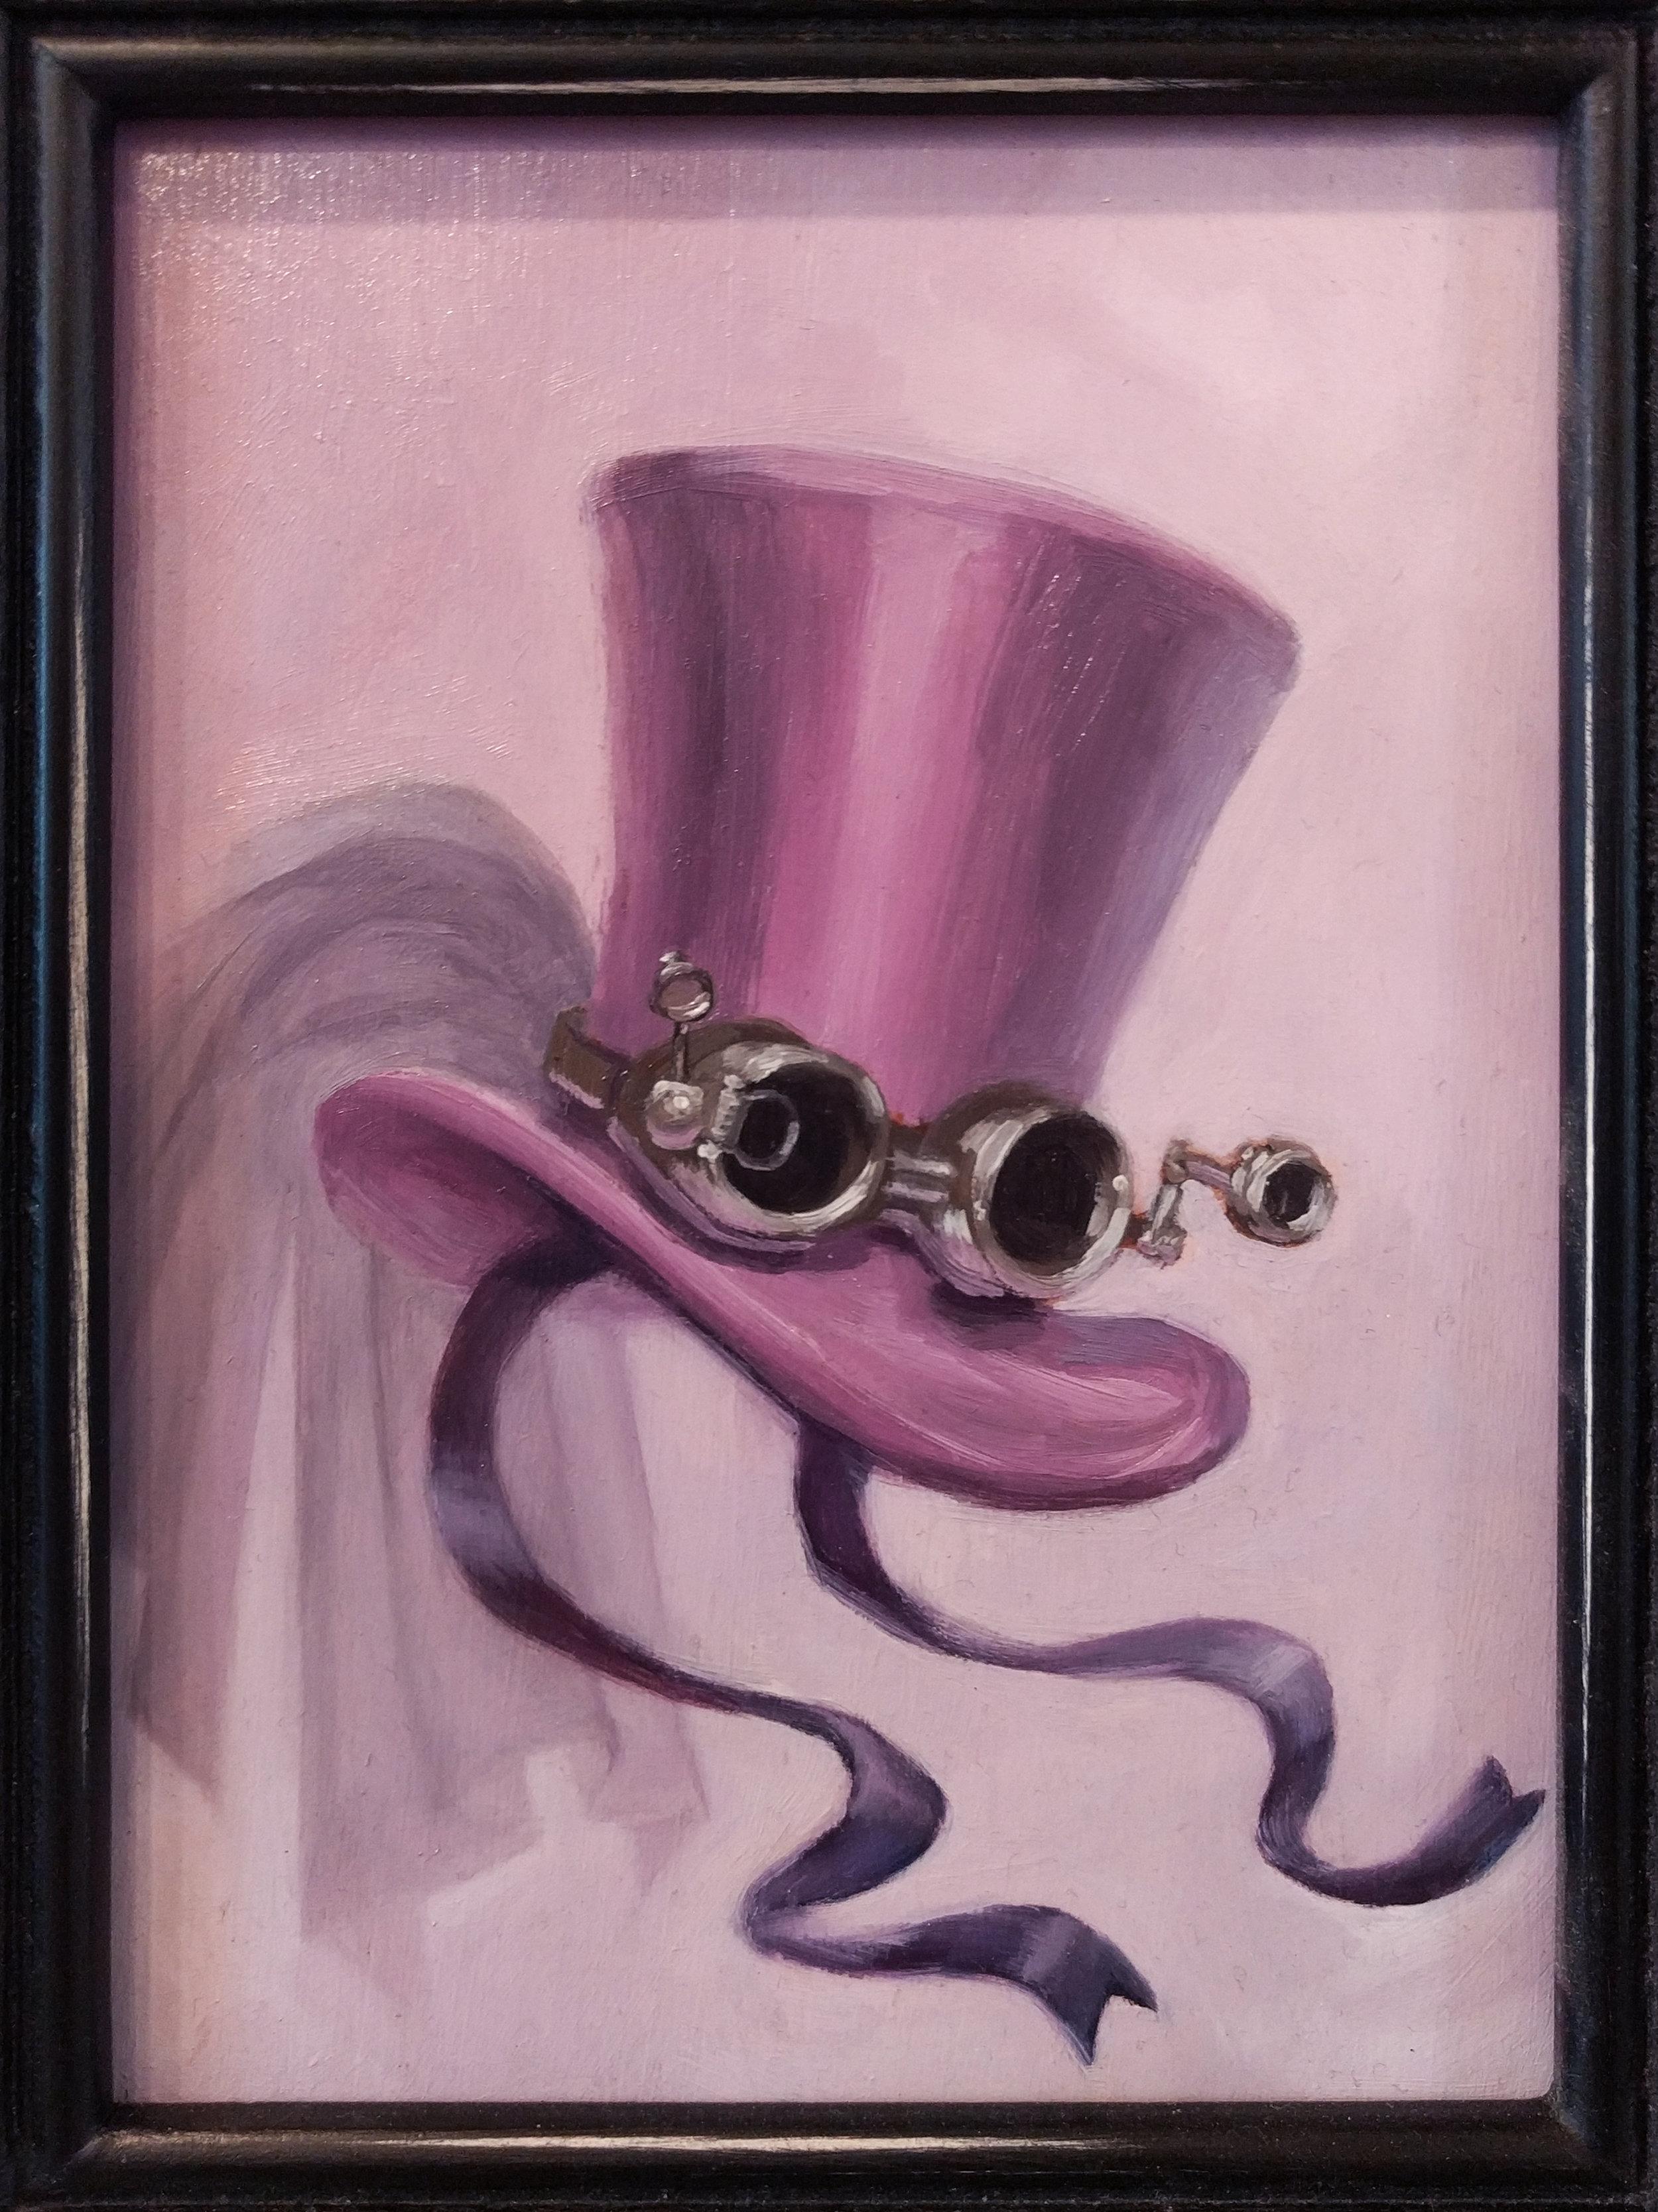 Top Hat: Lavender